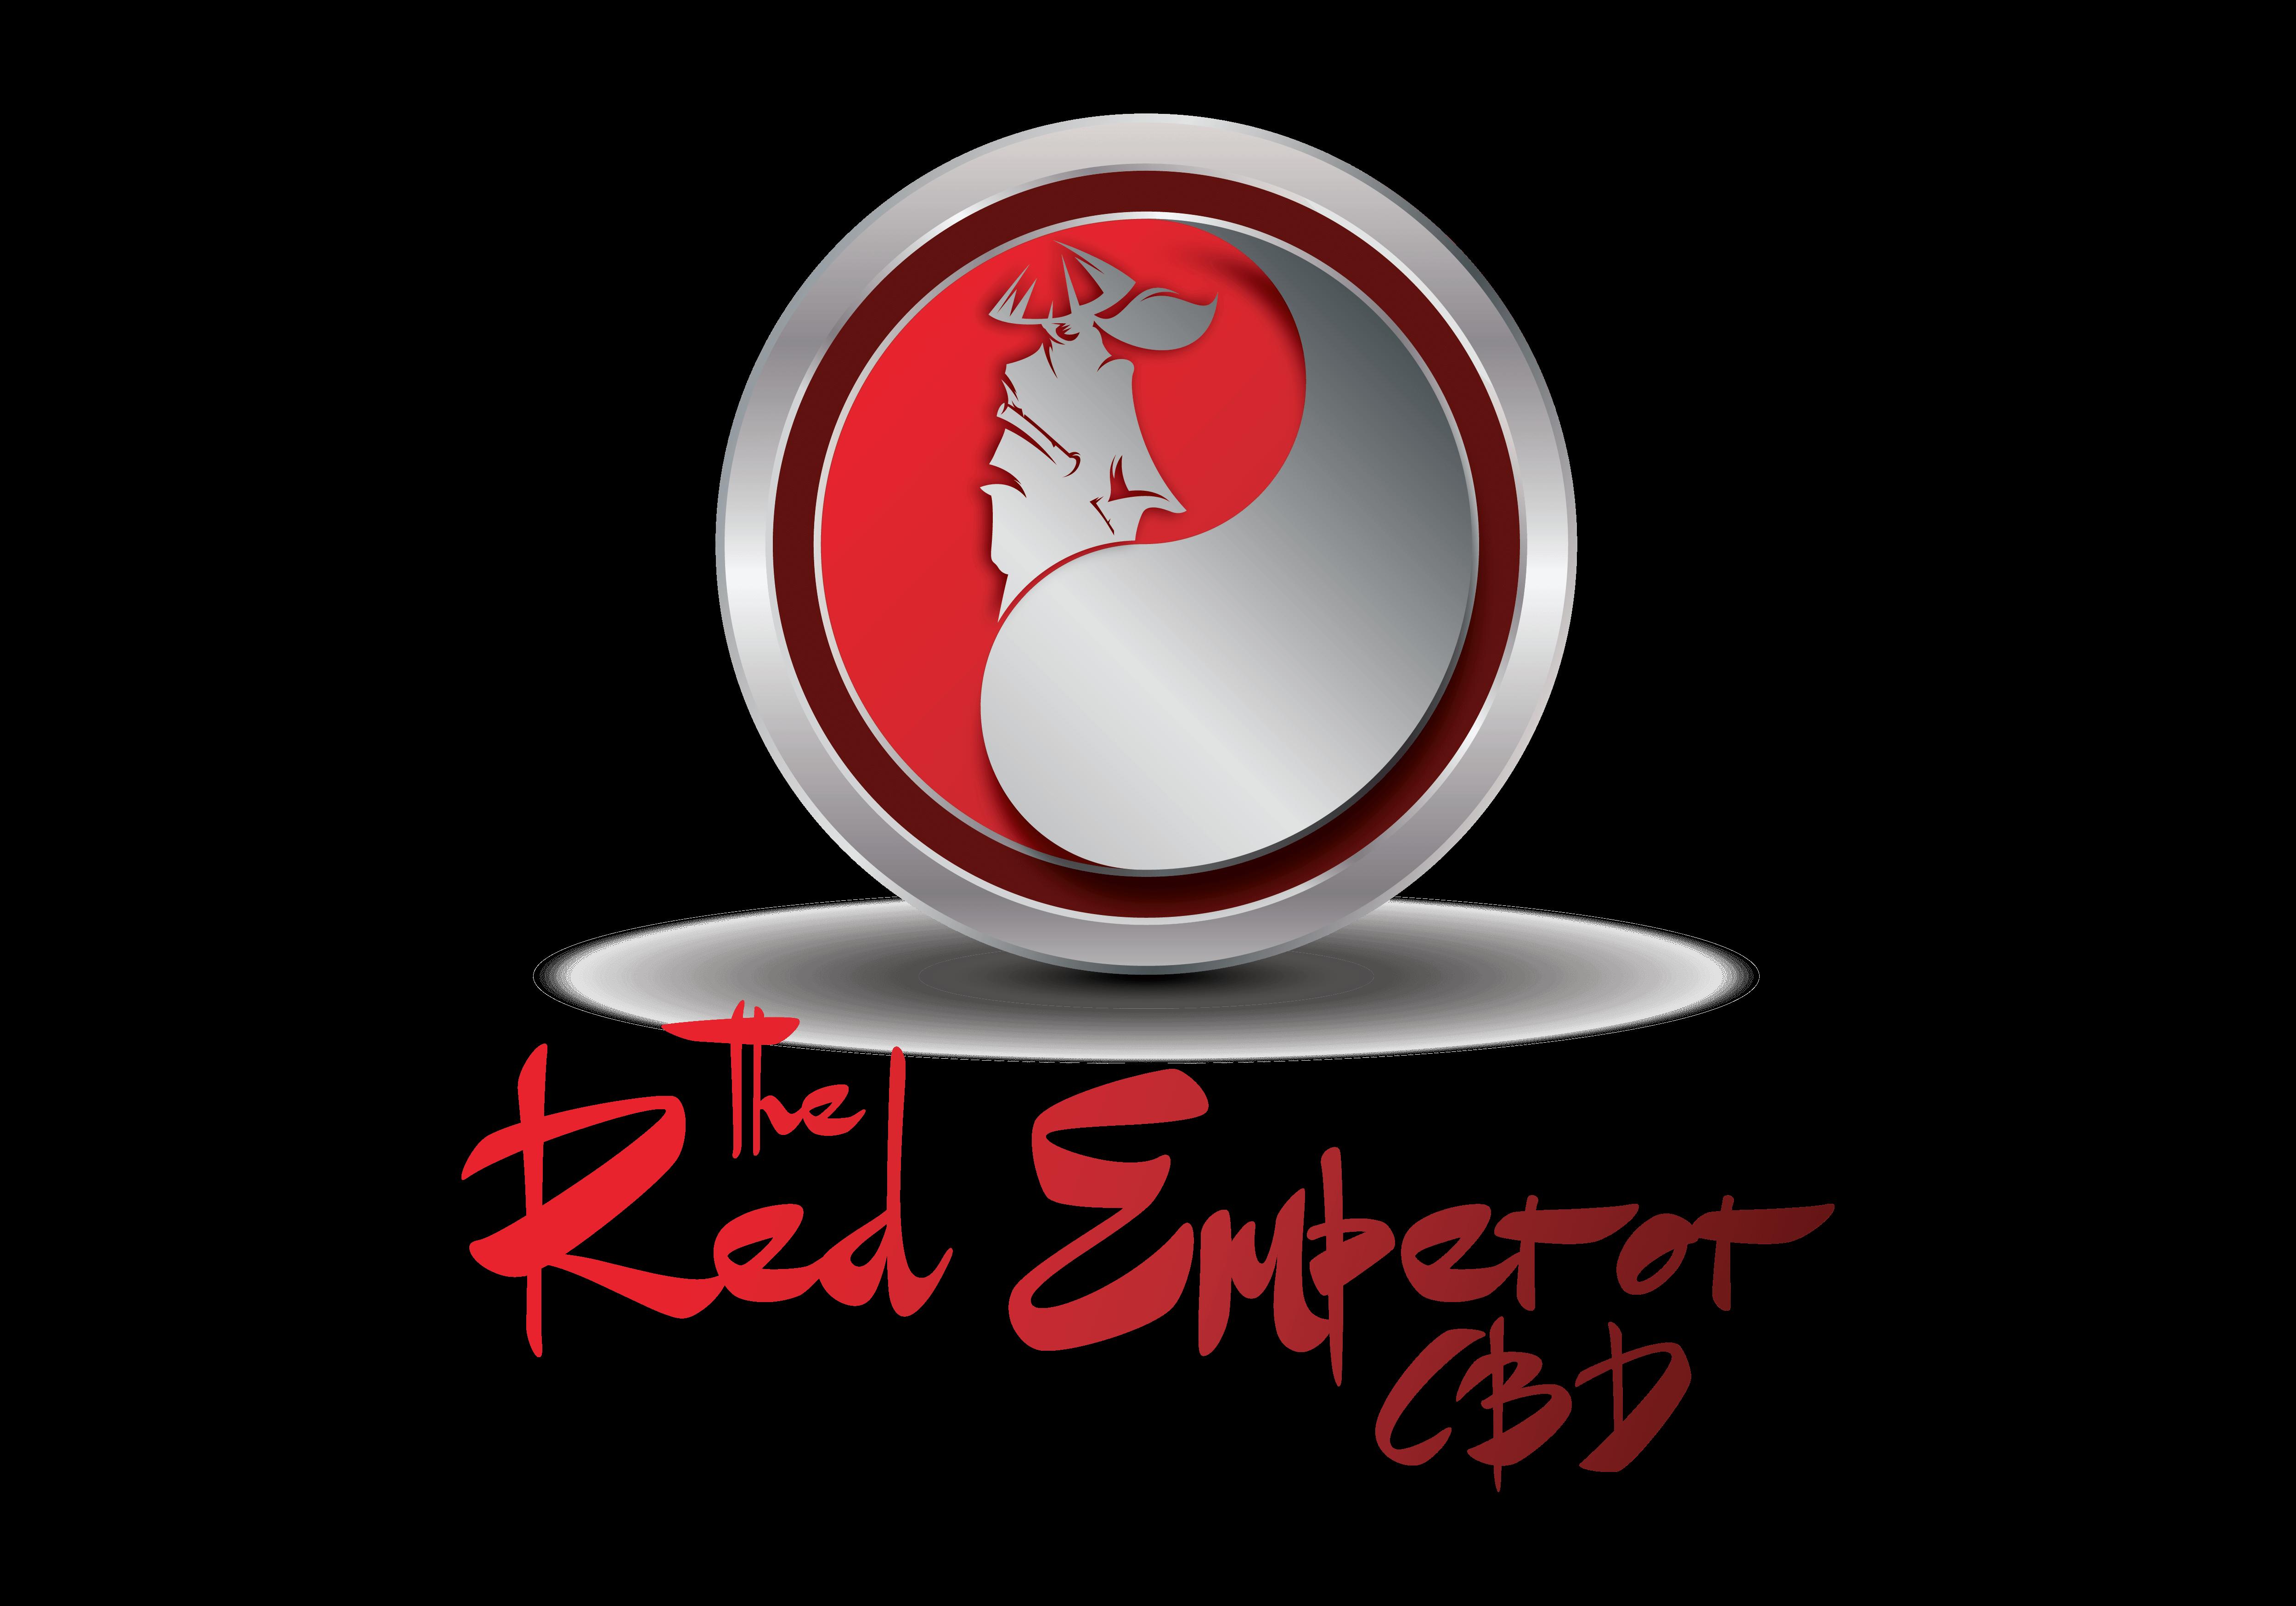 Red Emperor CBD Collective